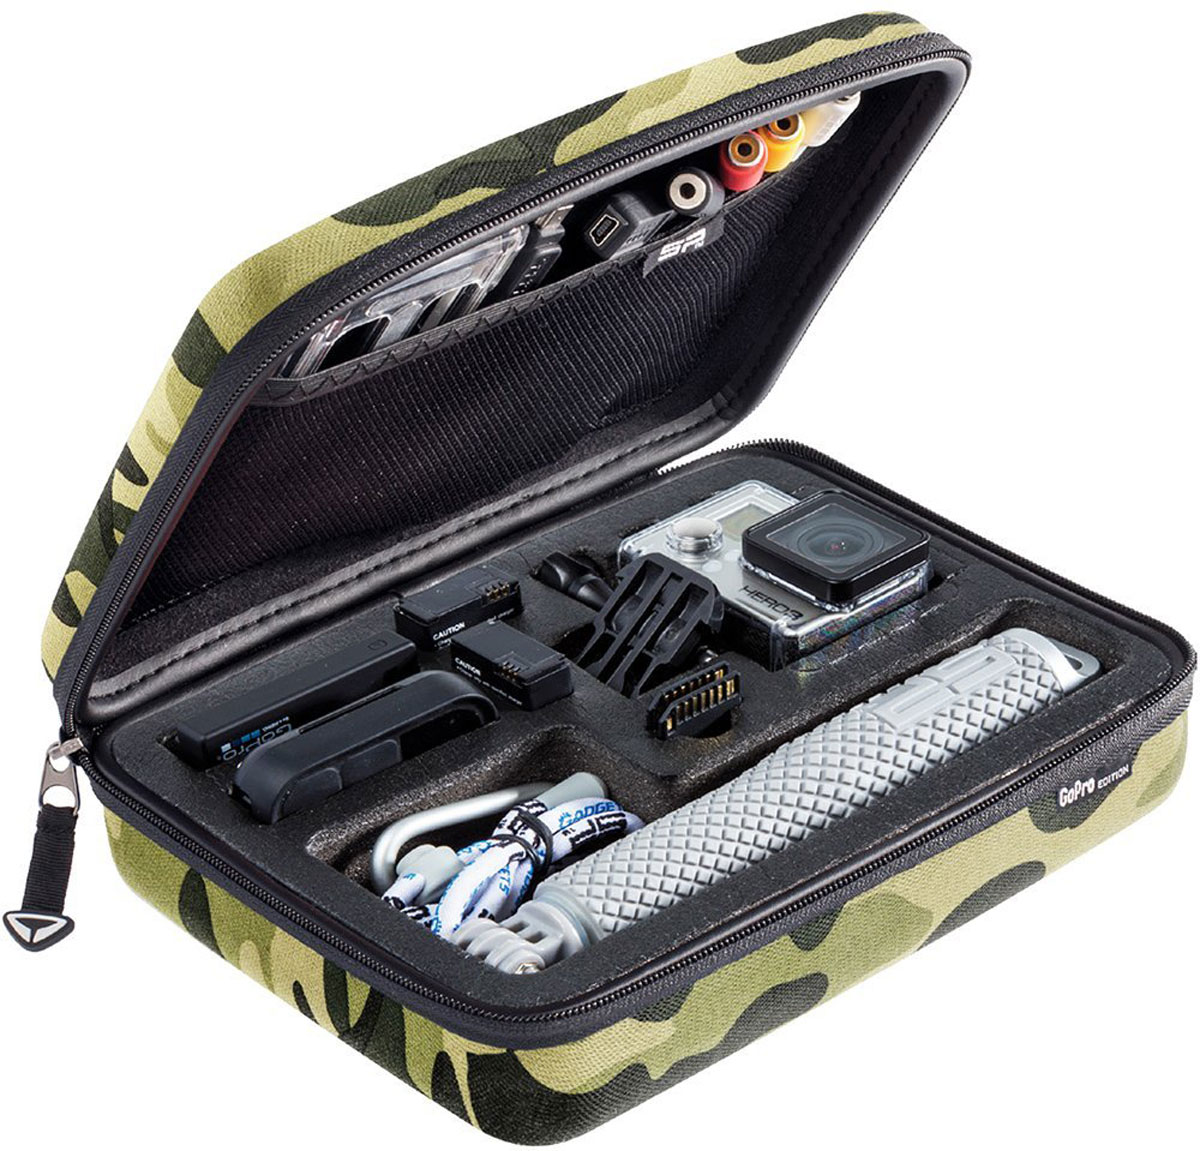 SP-Gadgets POV Case Small GoPro-Edition, Camel кейс для экшн-камеры sp gadgets pov buoy black монопод для экшн камеры